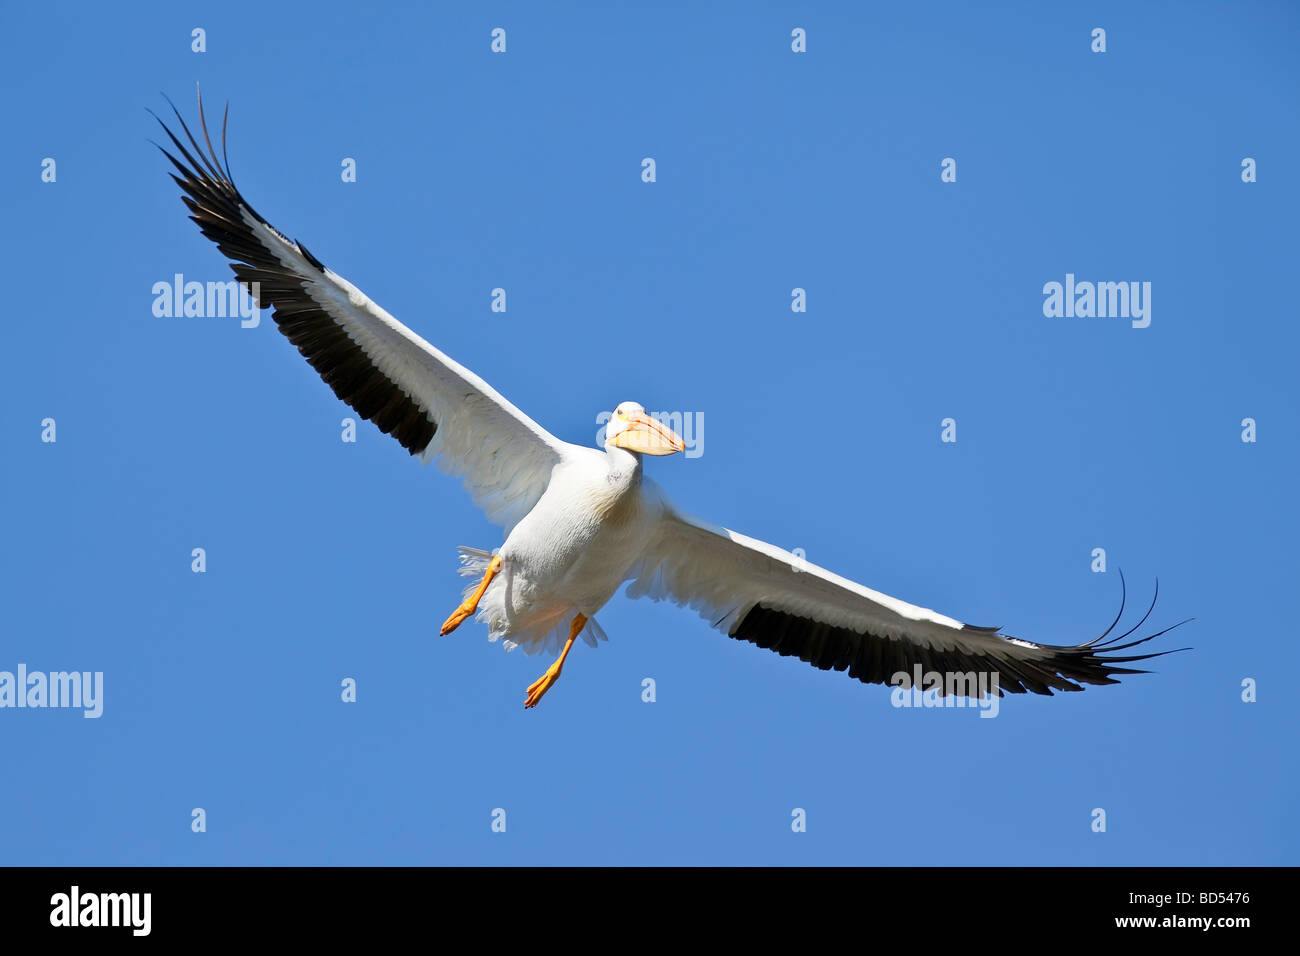 American White Pelican or Rough-billed Pelican (Pelecanus erythrorhynchos), in flight - Stock Image